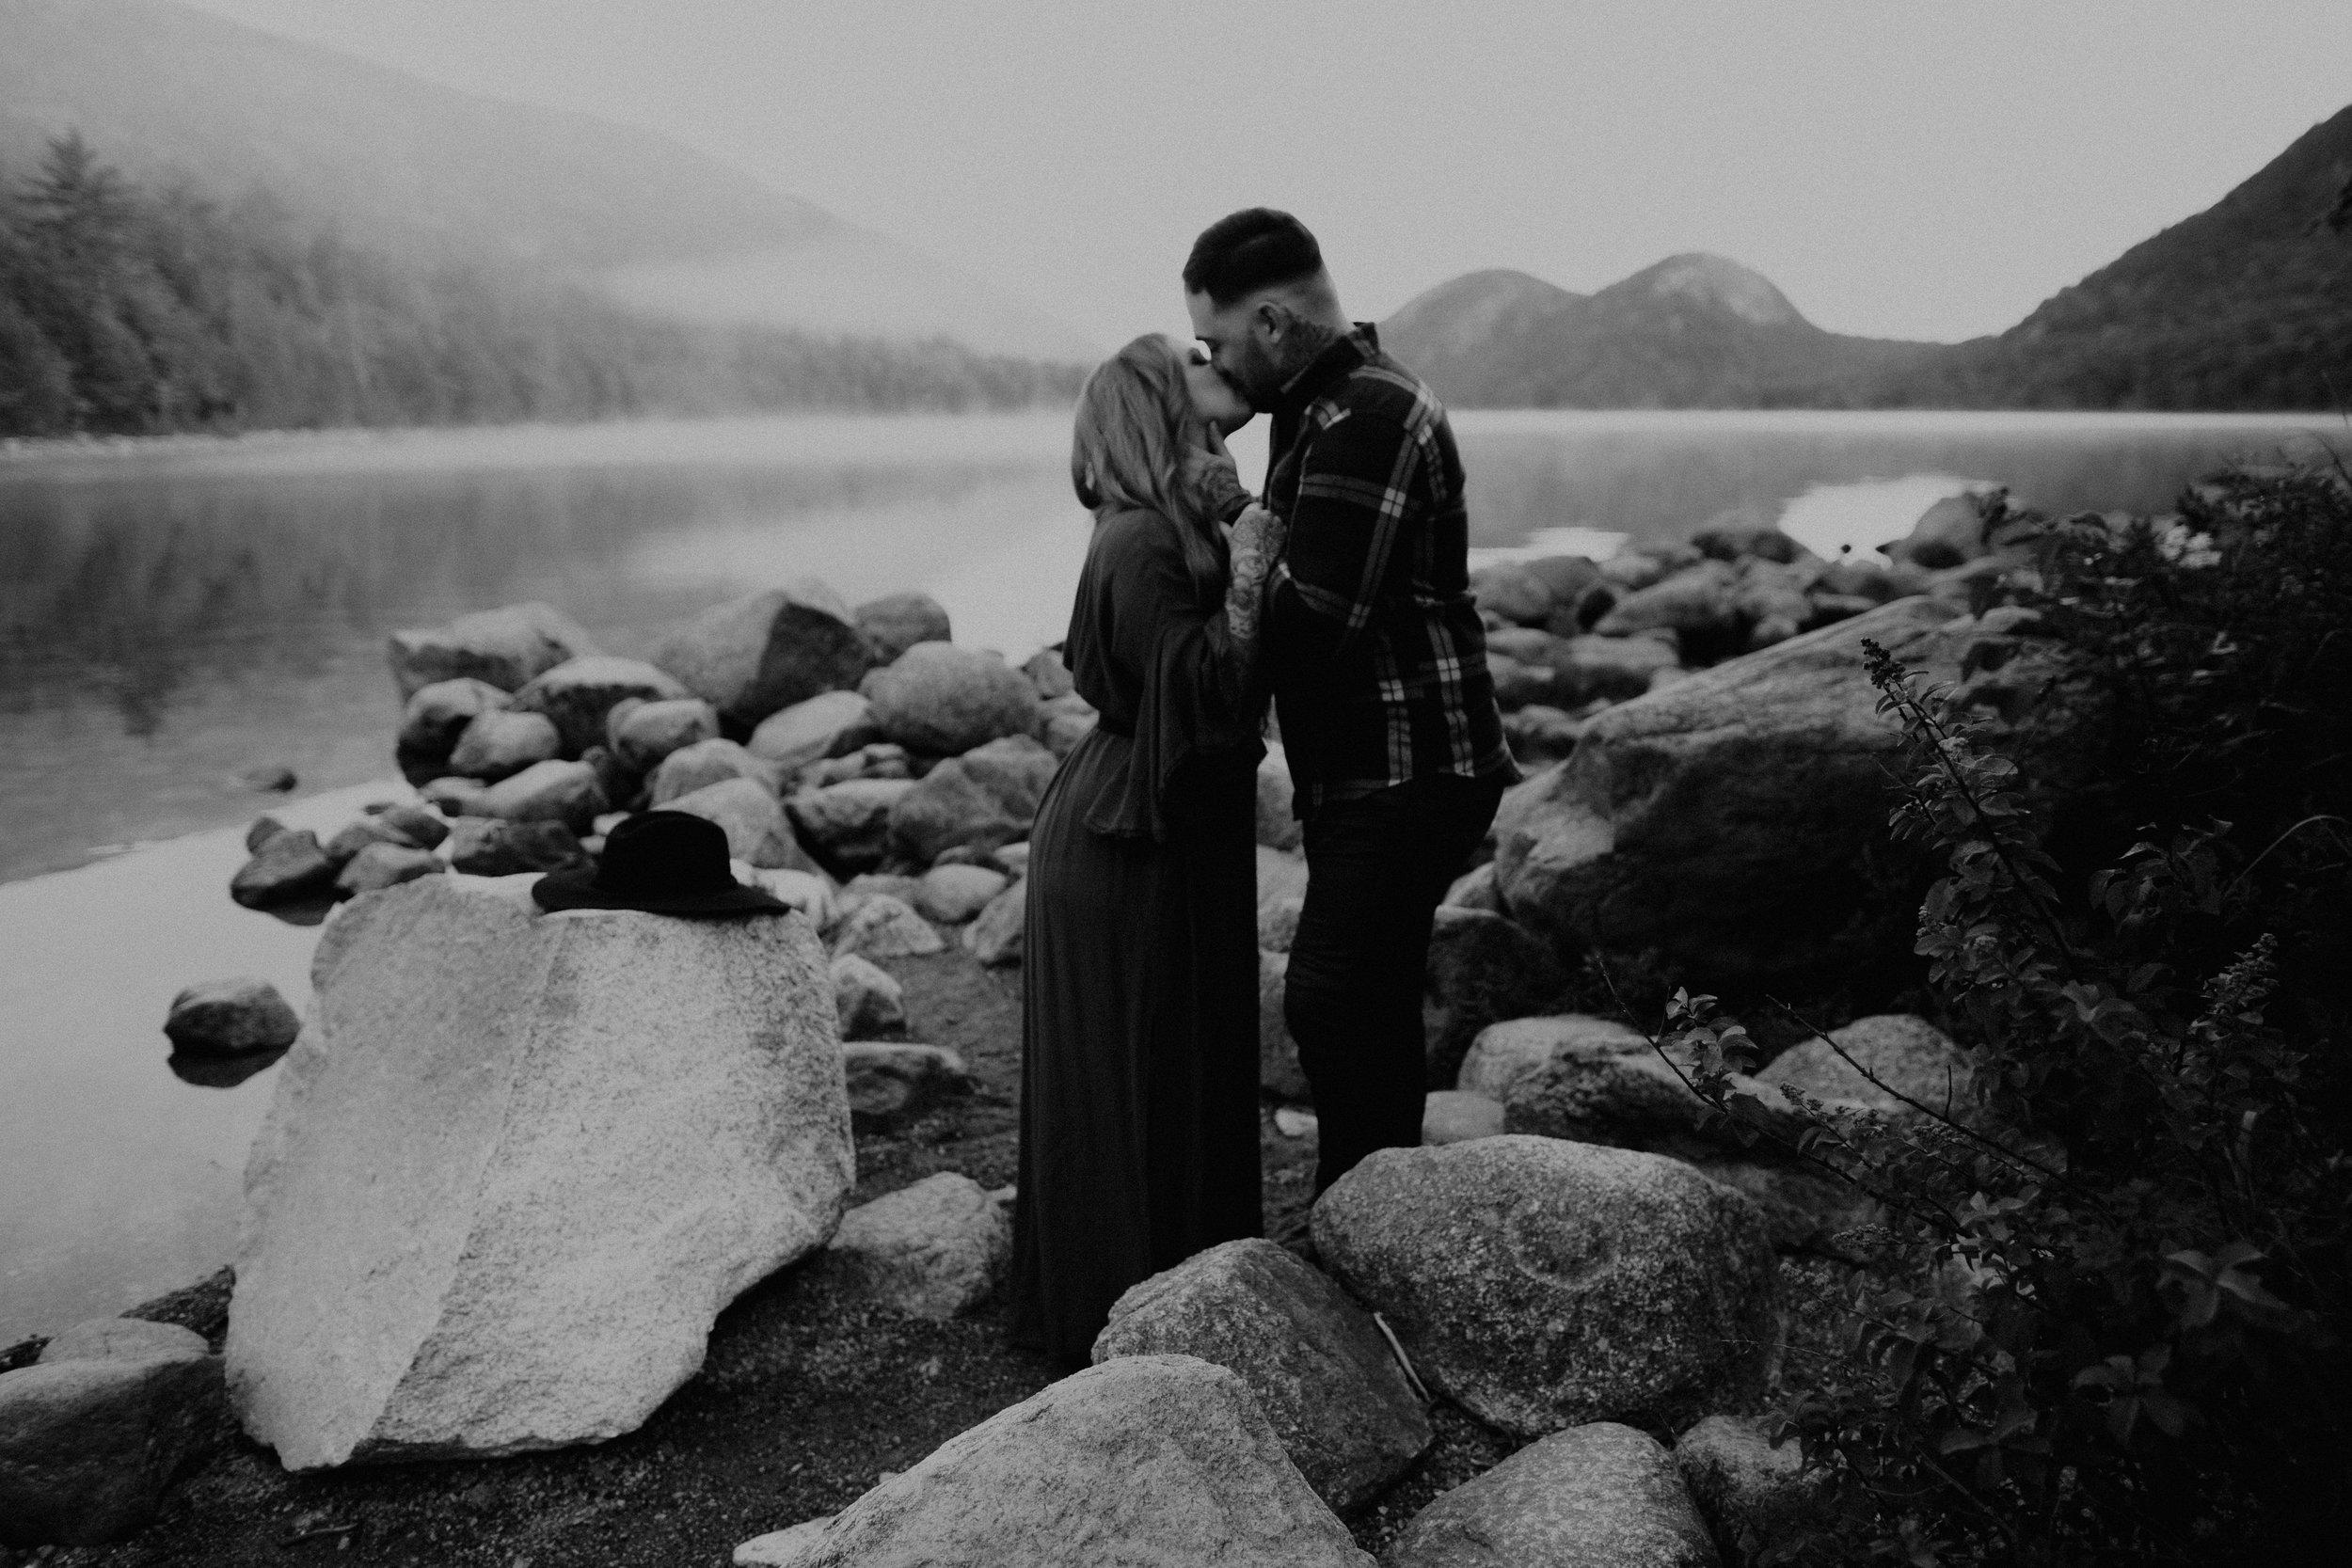 Brittany_Nick_engagement-2.jpg